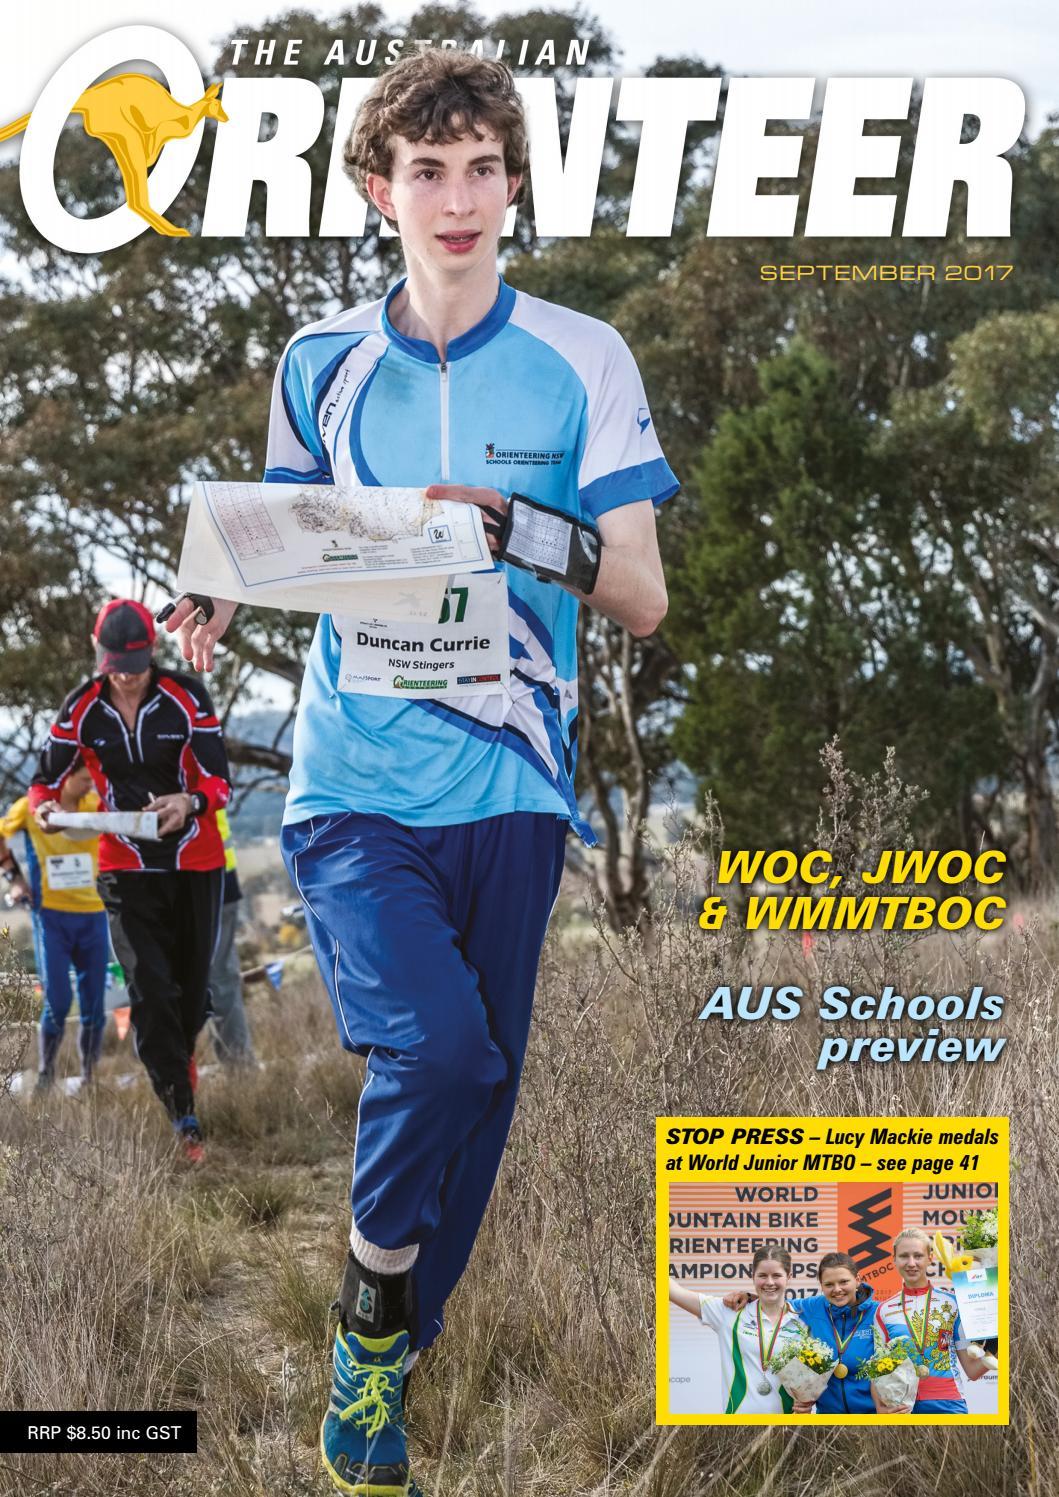 f4da86c7d1b The Australian Orienteer – September 2017 by Orienteering Australia - issuu